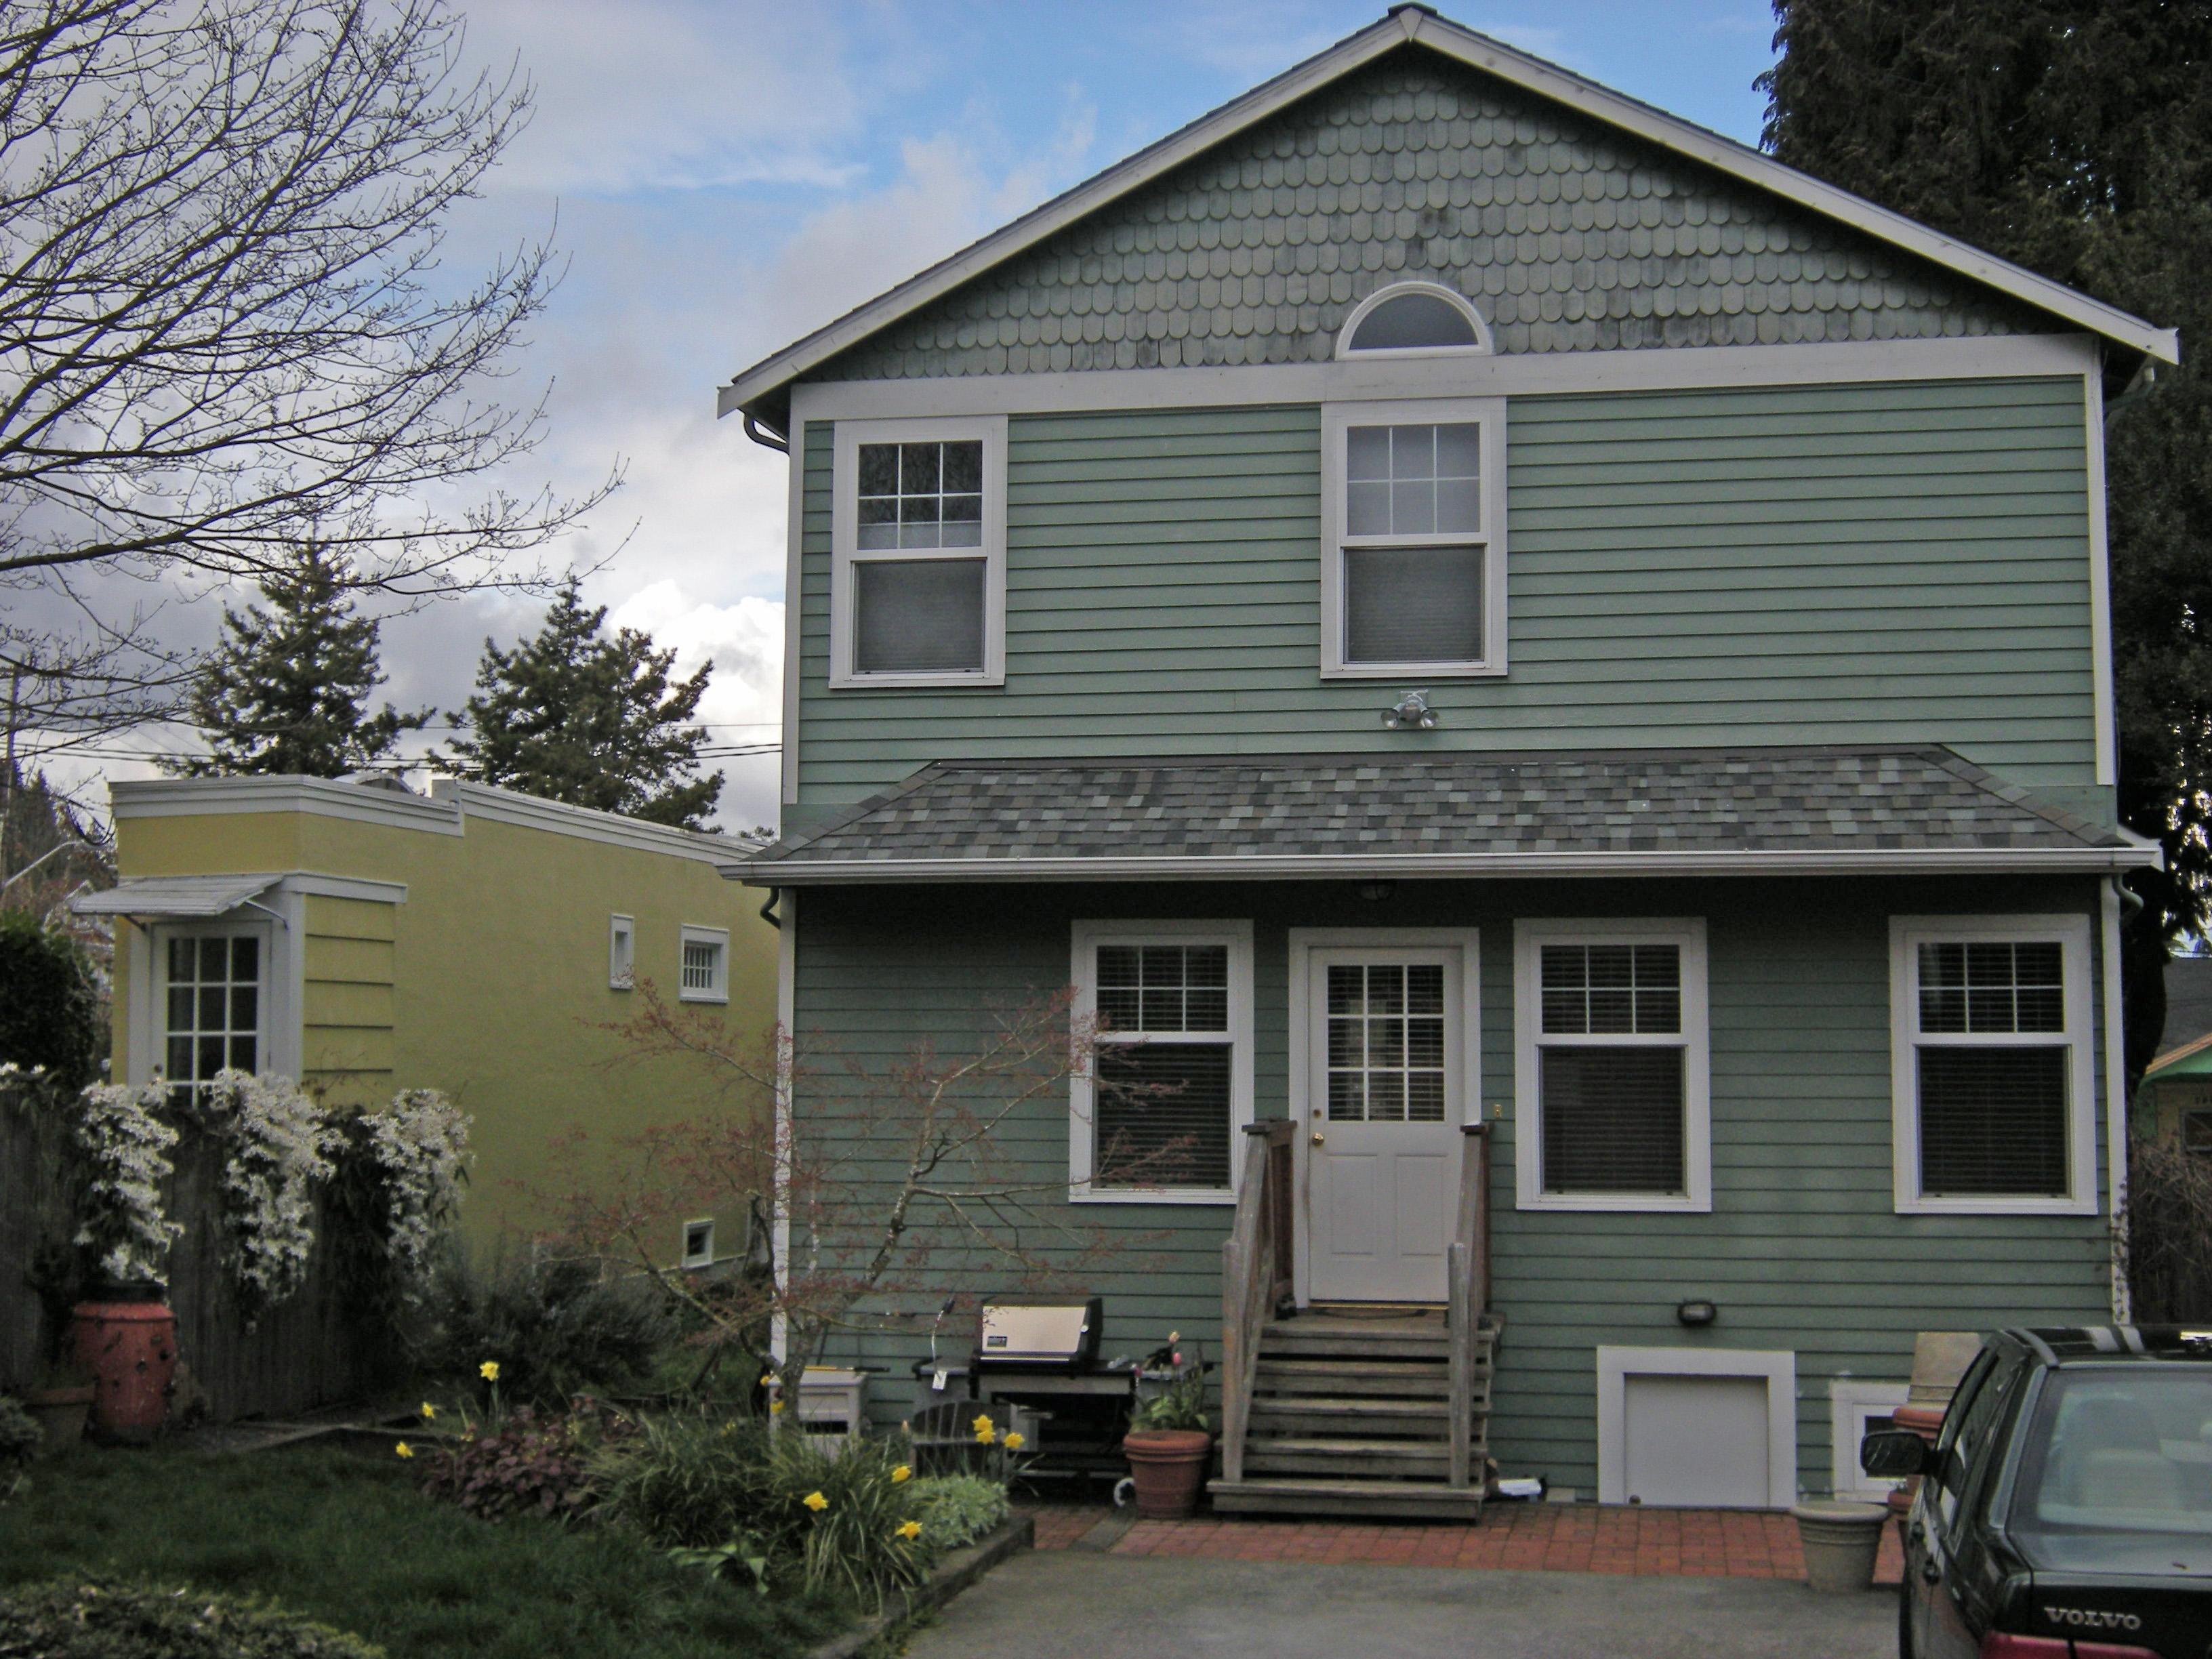 Duplex Homes For Sale In Gardena Ca